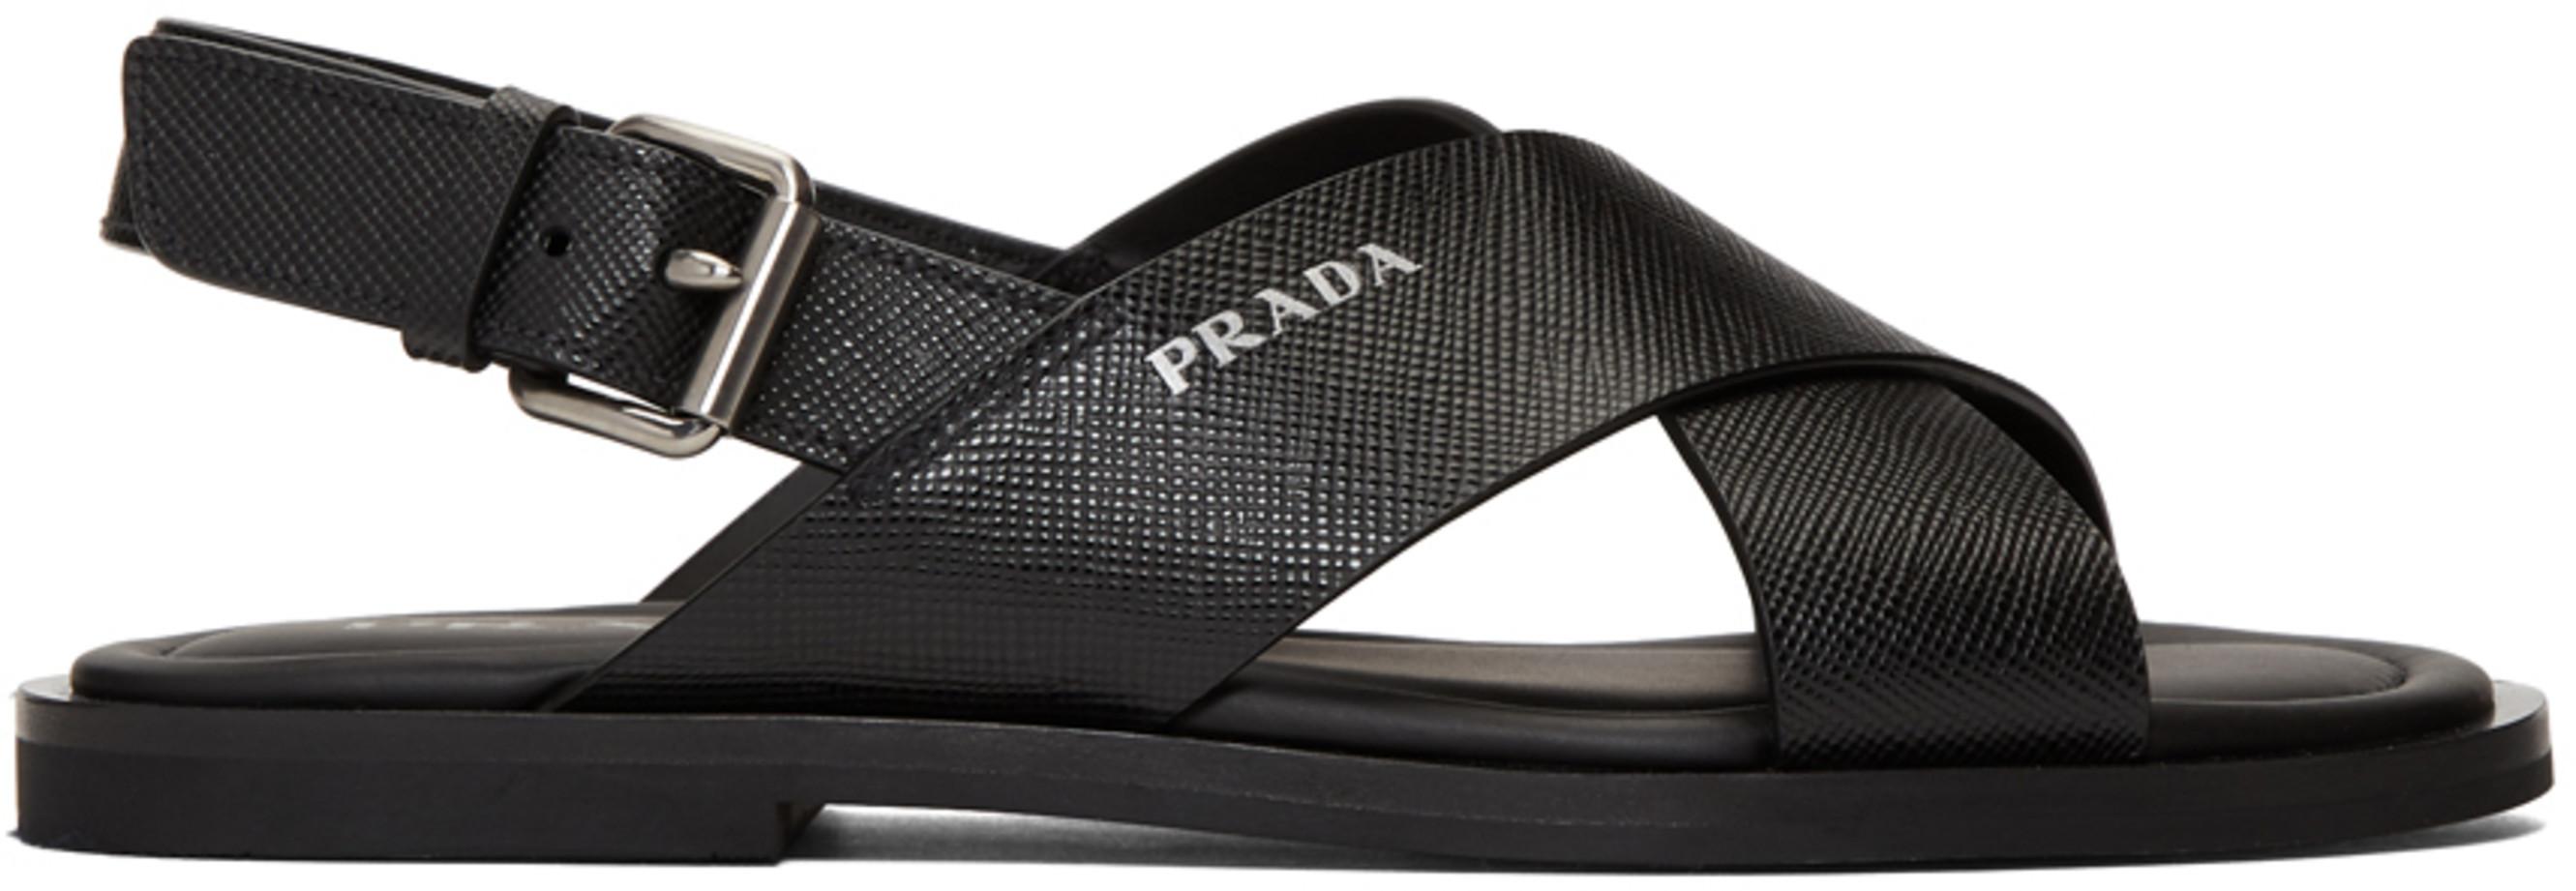 972401c90 Designer sandals for Men